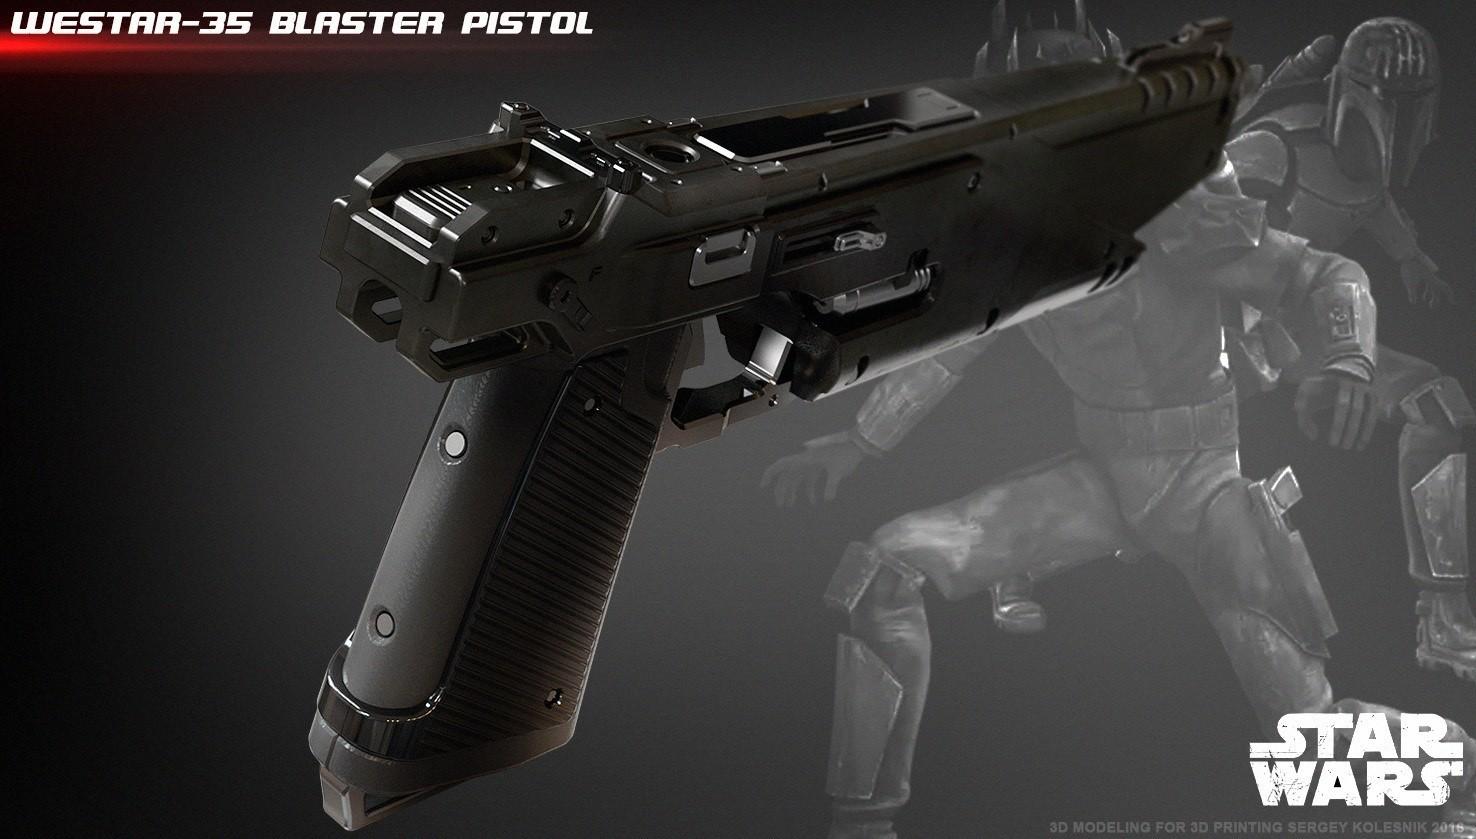 3.jpg Download STL file WESTAR 35 blaster pistol  • 3D printable object, 3dpicasso